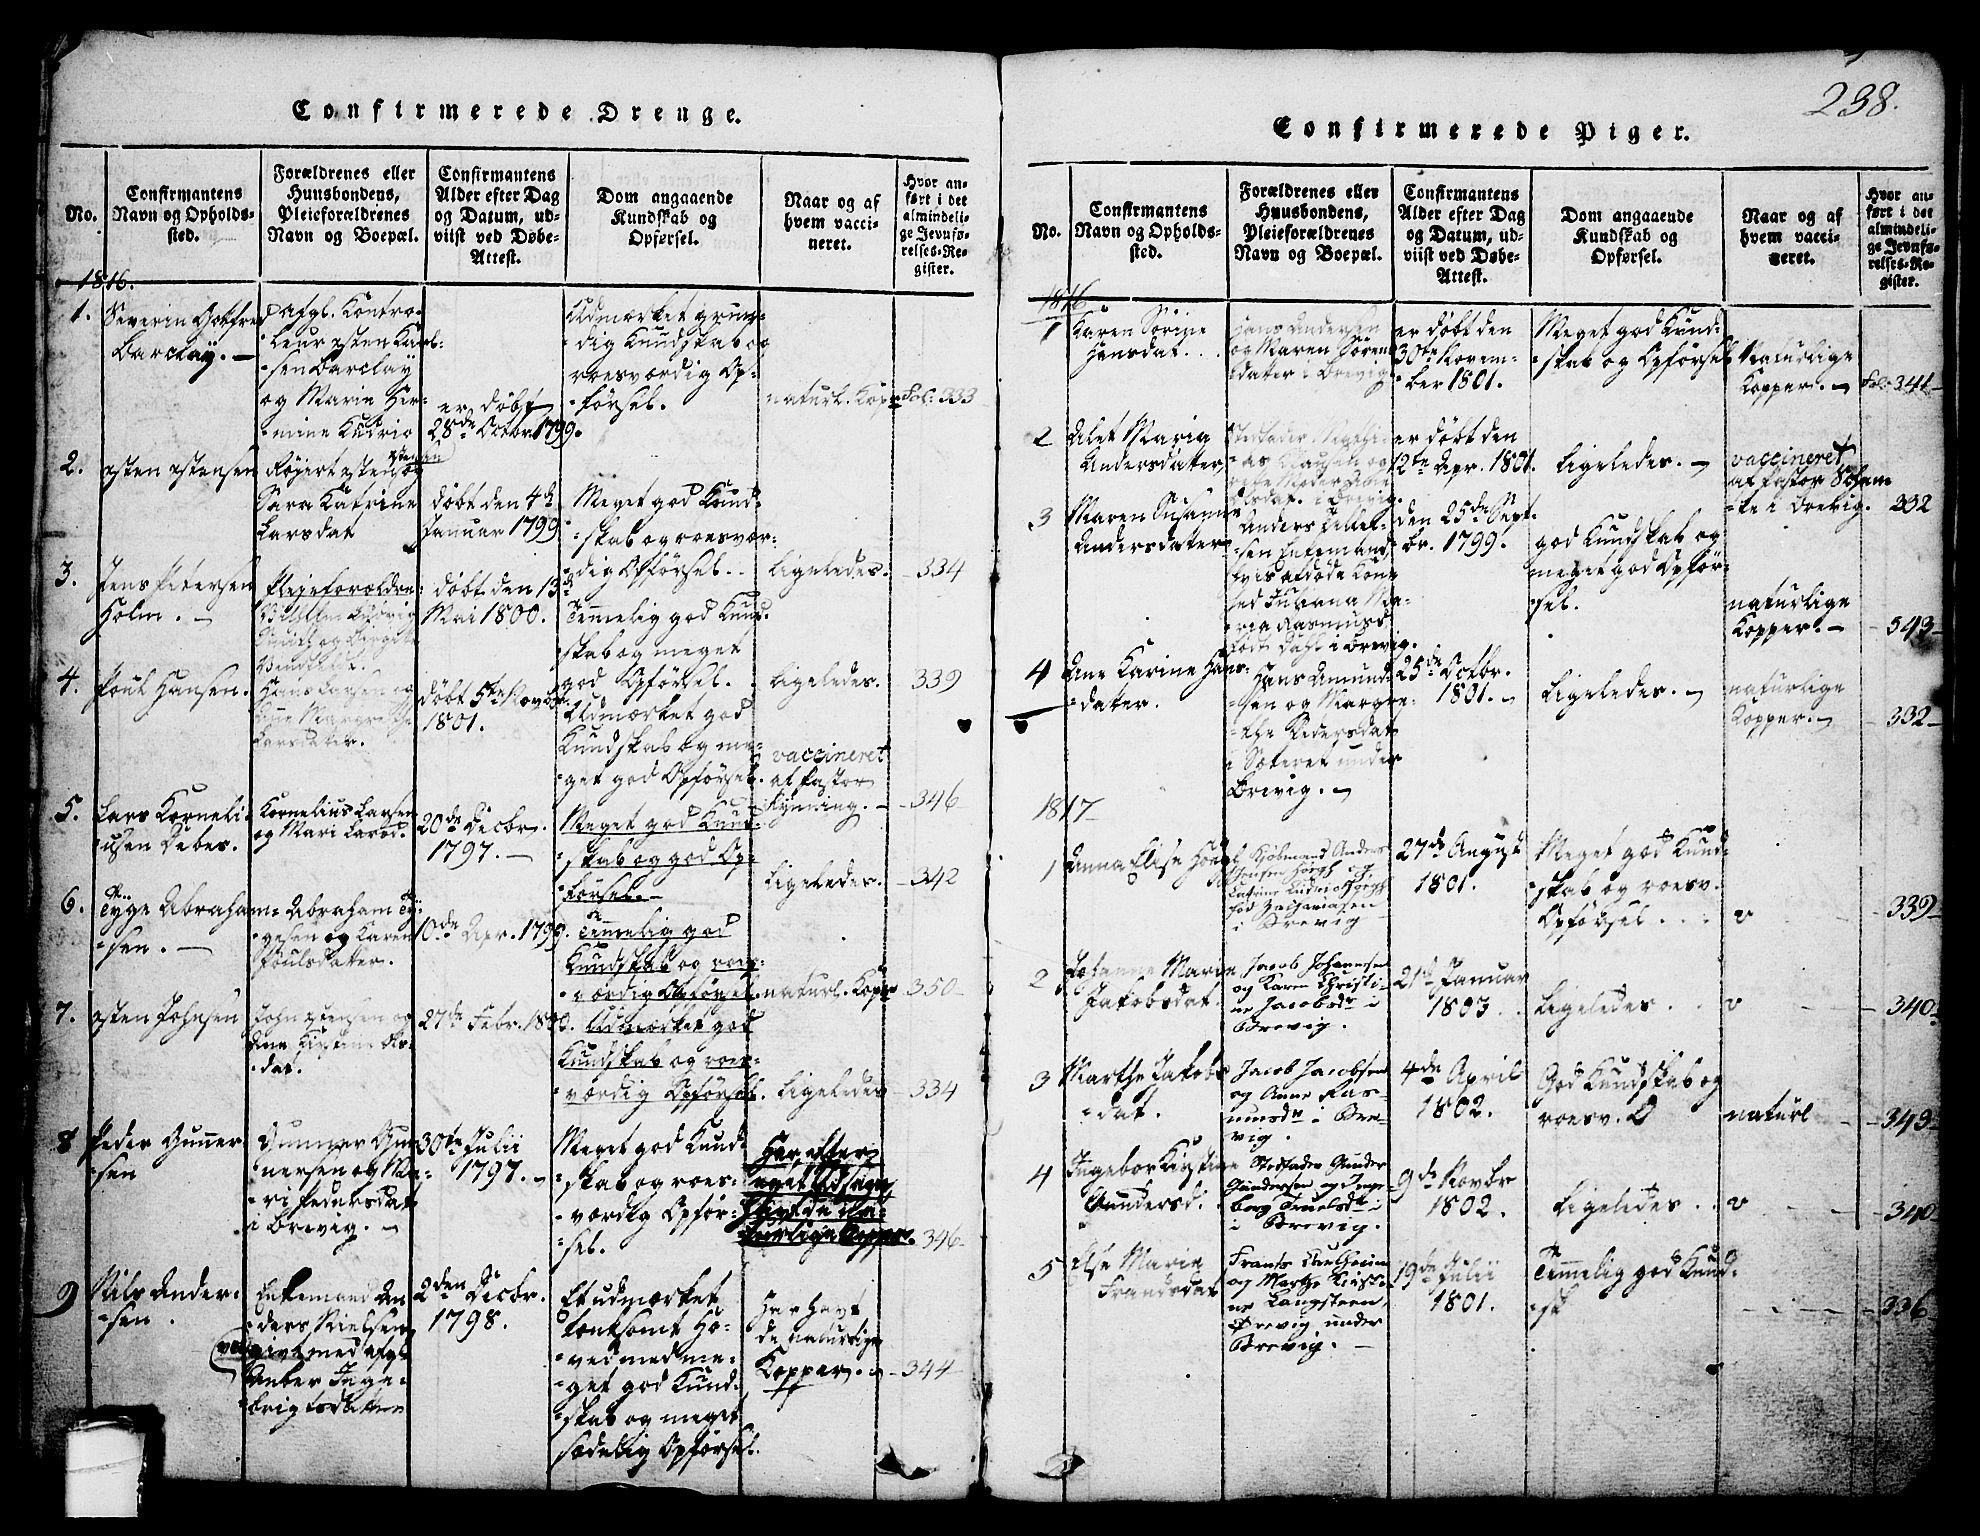 SAKO, Brevik kirkebøker, G/Ga/L0001: Klokkerbok nr. 1, 1814-1845, s. 238